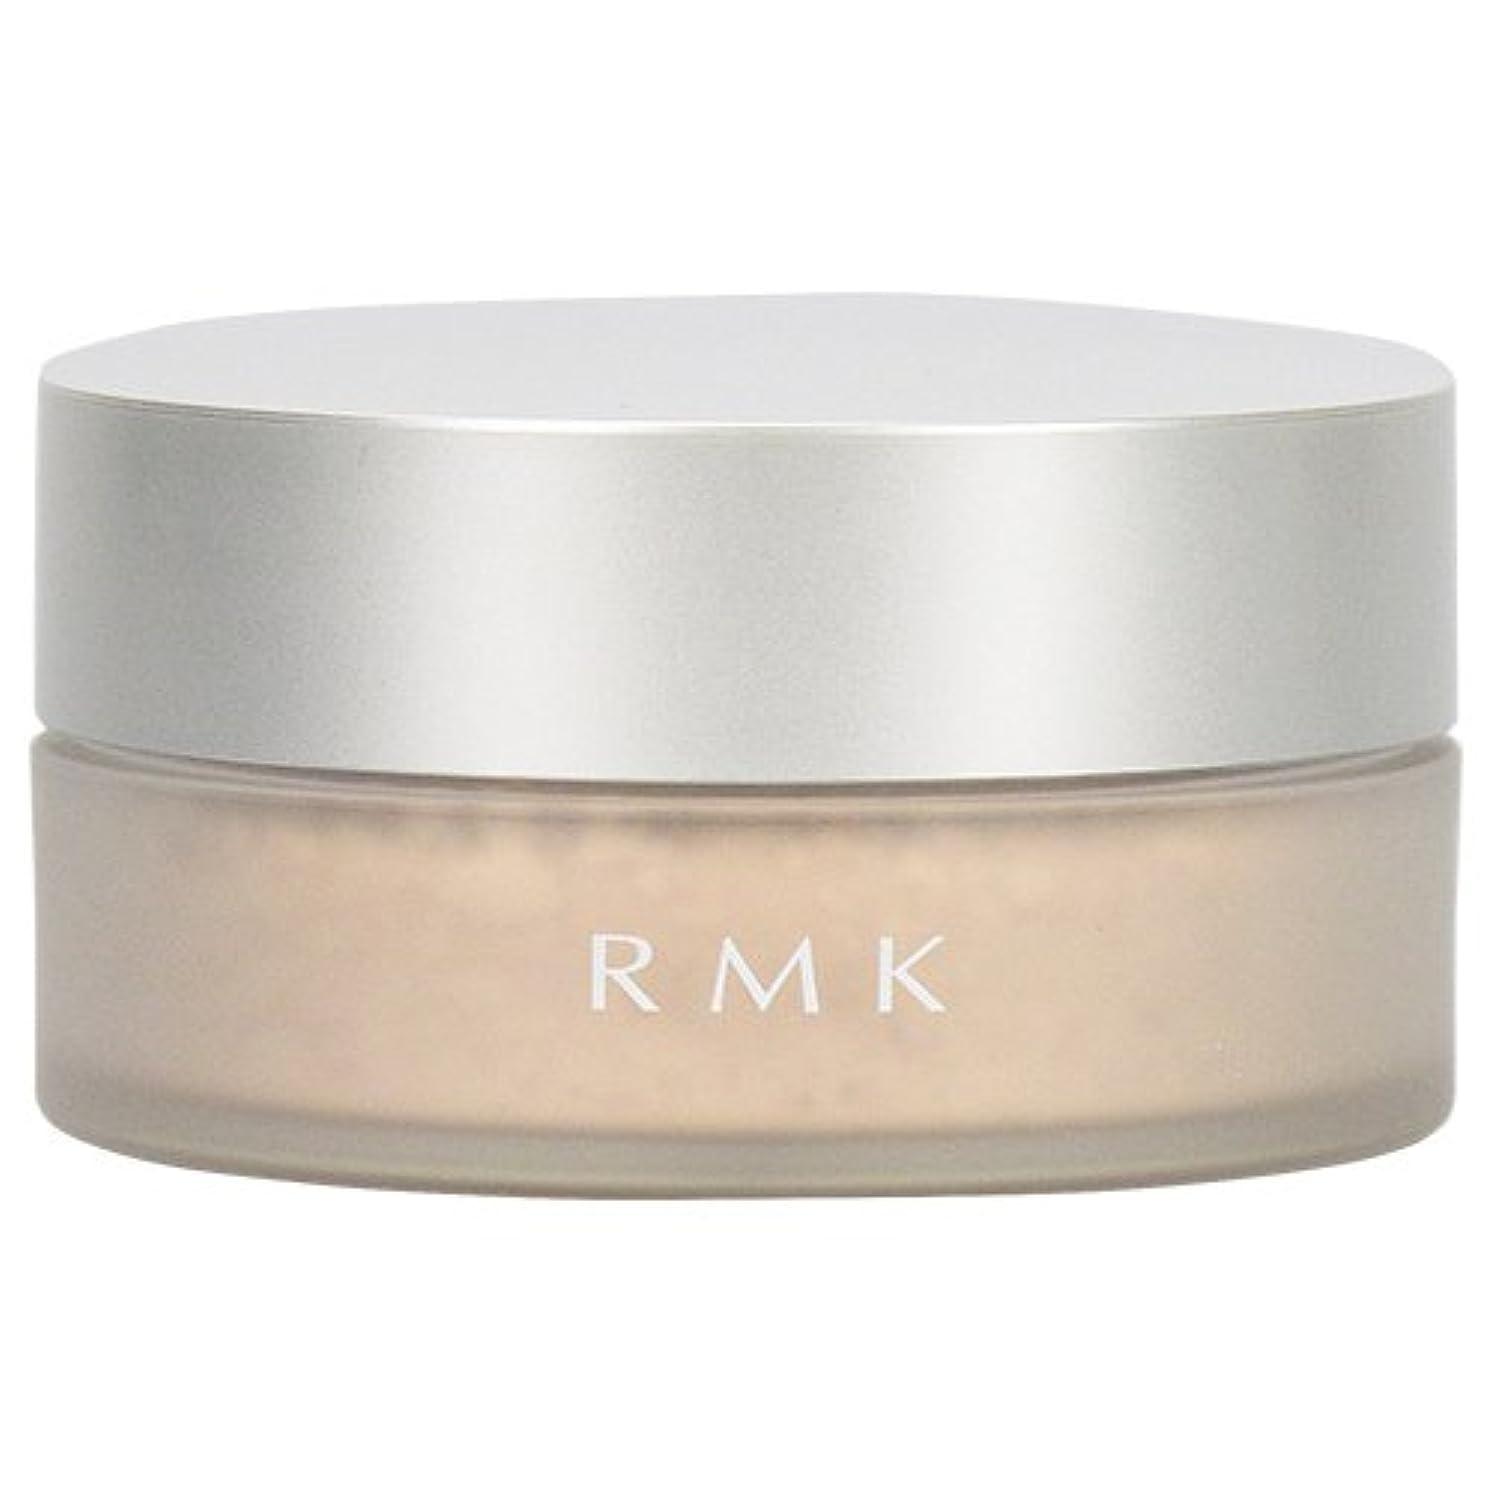 RMK トランスルーセント フェイスパウダー #02 [並行輸入品]